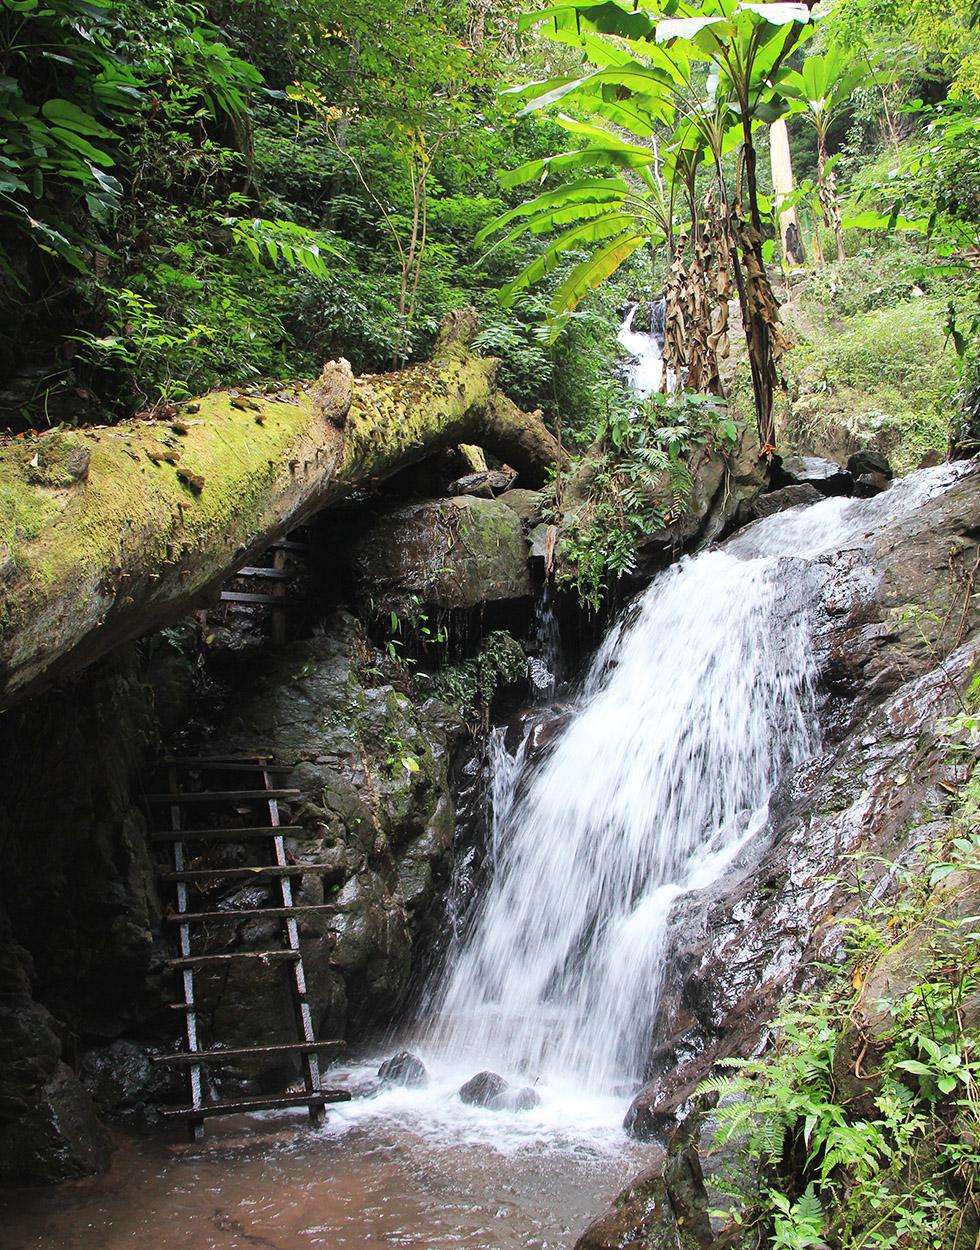 Champa Thong Waterfall in Phayao